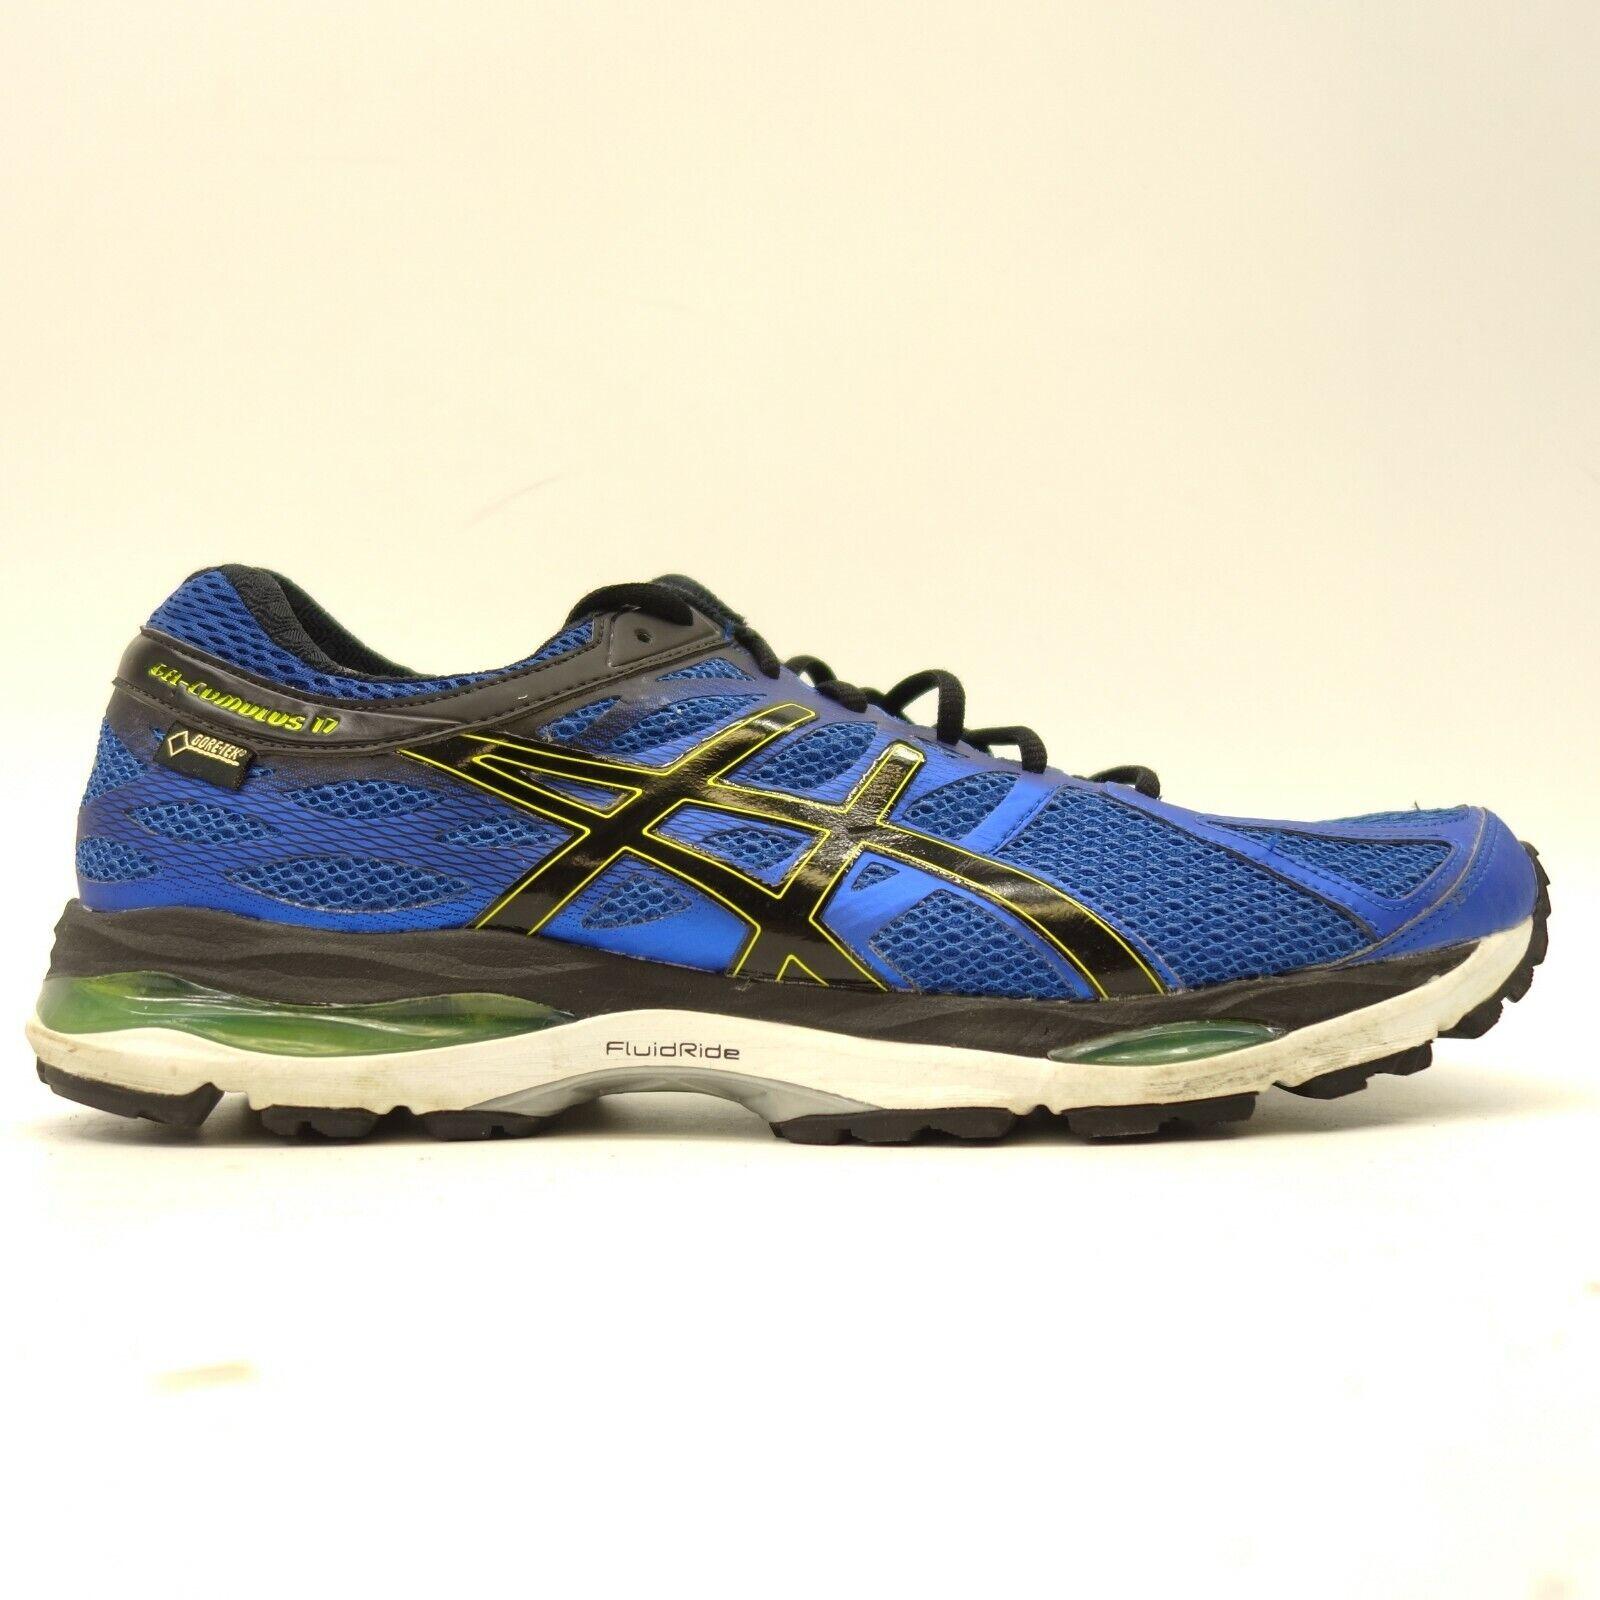 Asics Gel Cumulus 17 Wp US 12 Eu 46.5 Blau Sportliche Laufen Trainieren